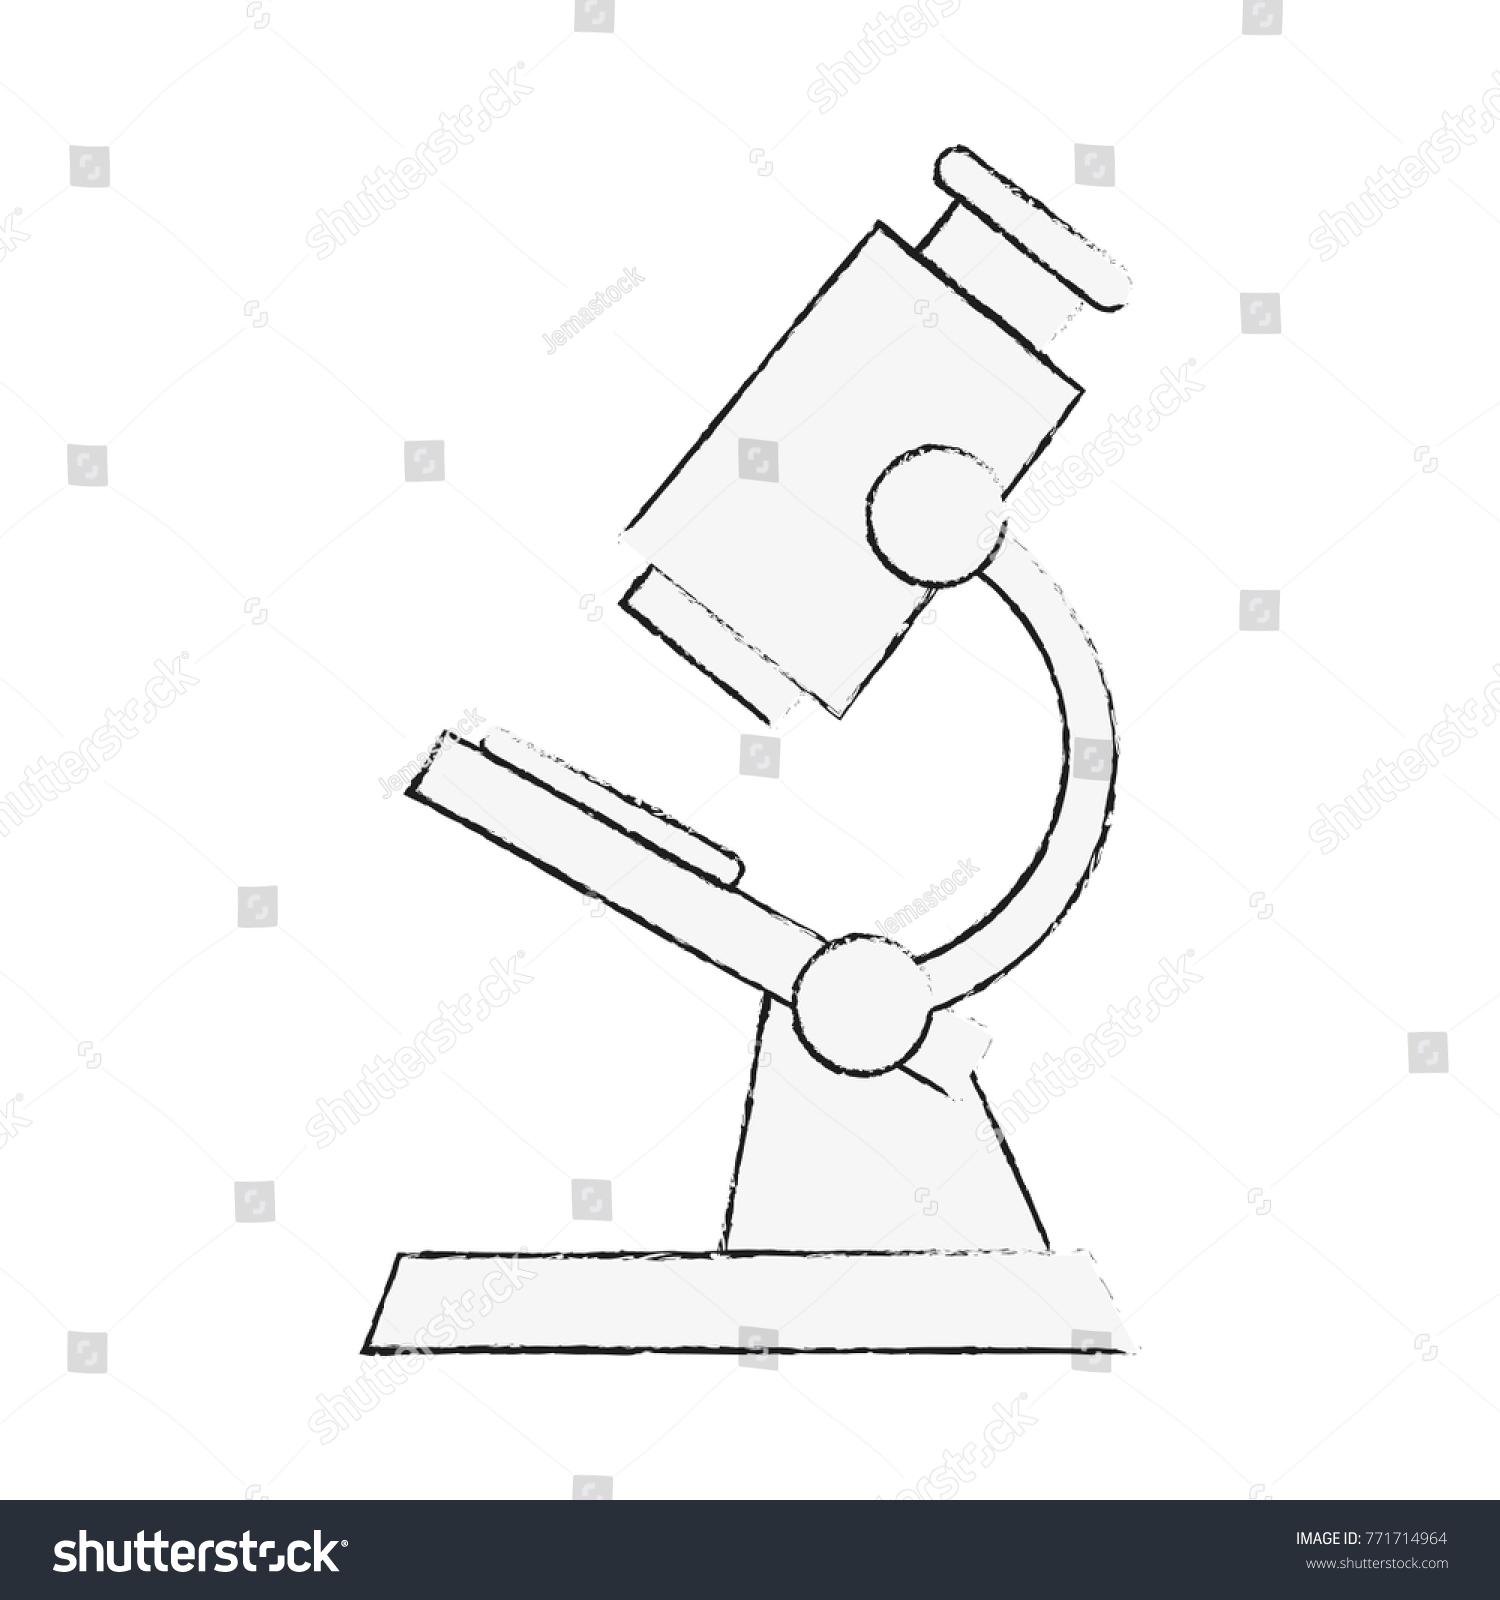 Microscope laboratory tool stock vector 771714964 shutterstock ccuart Gallery